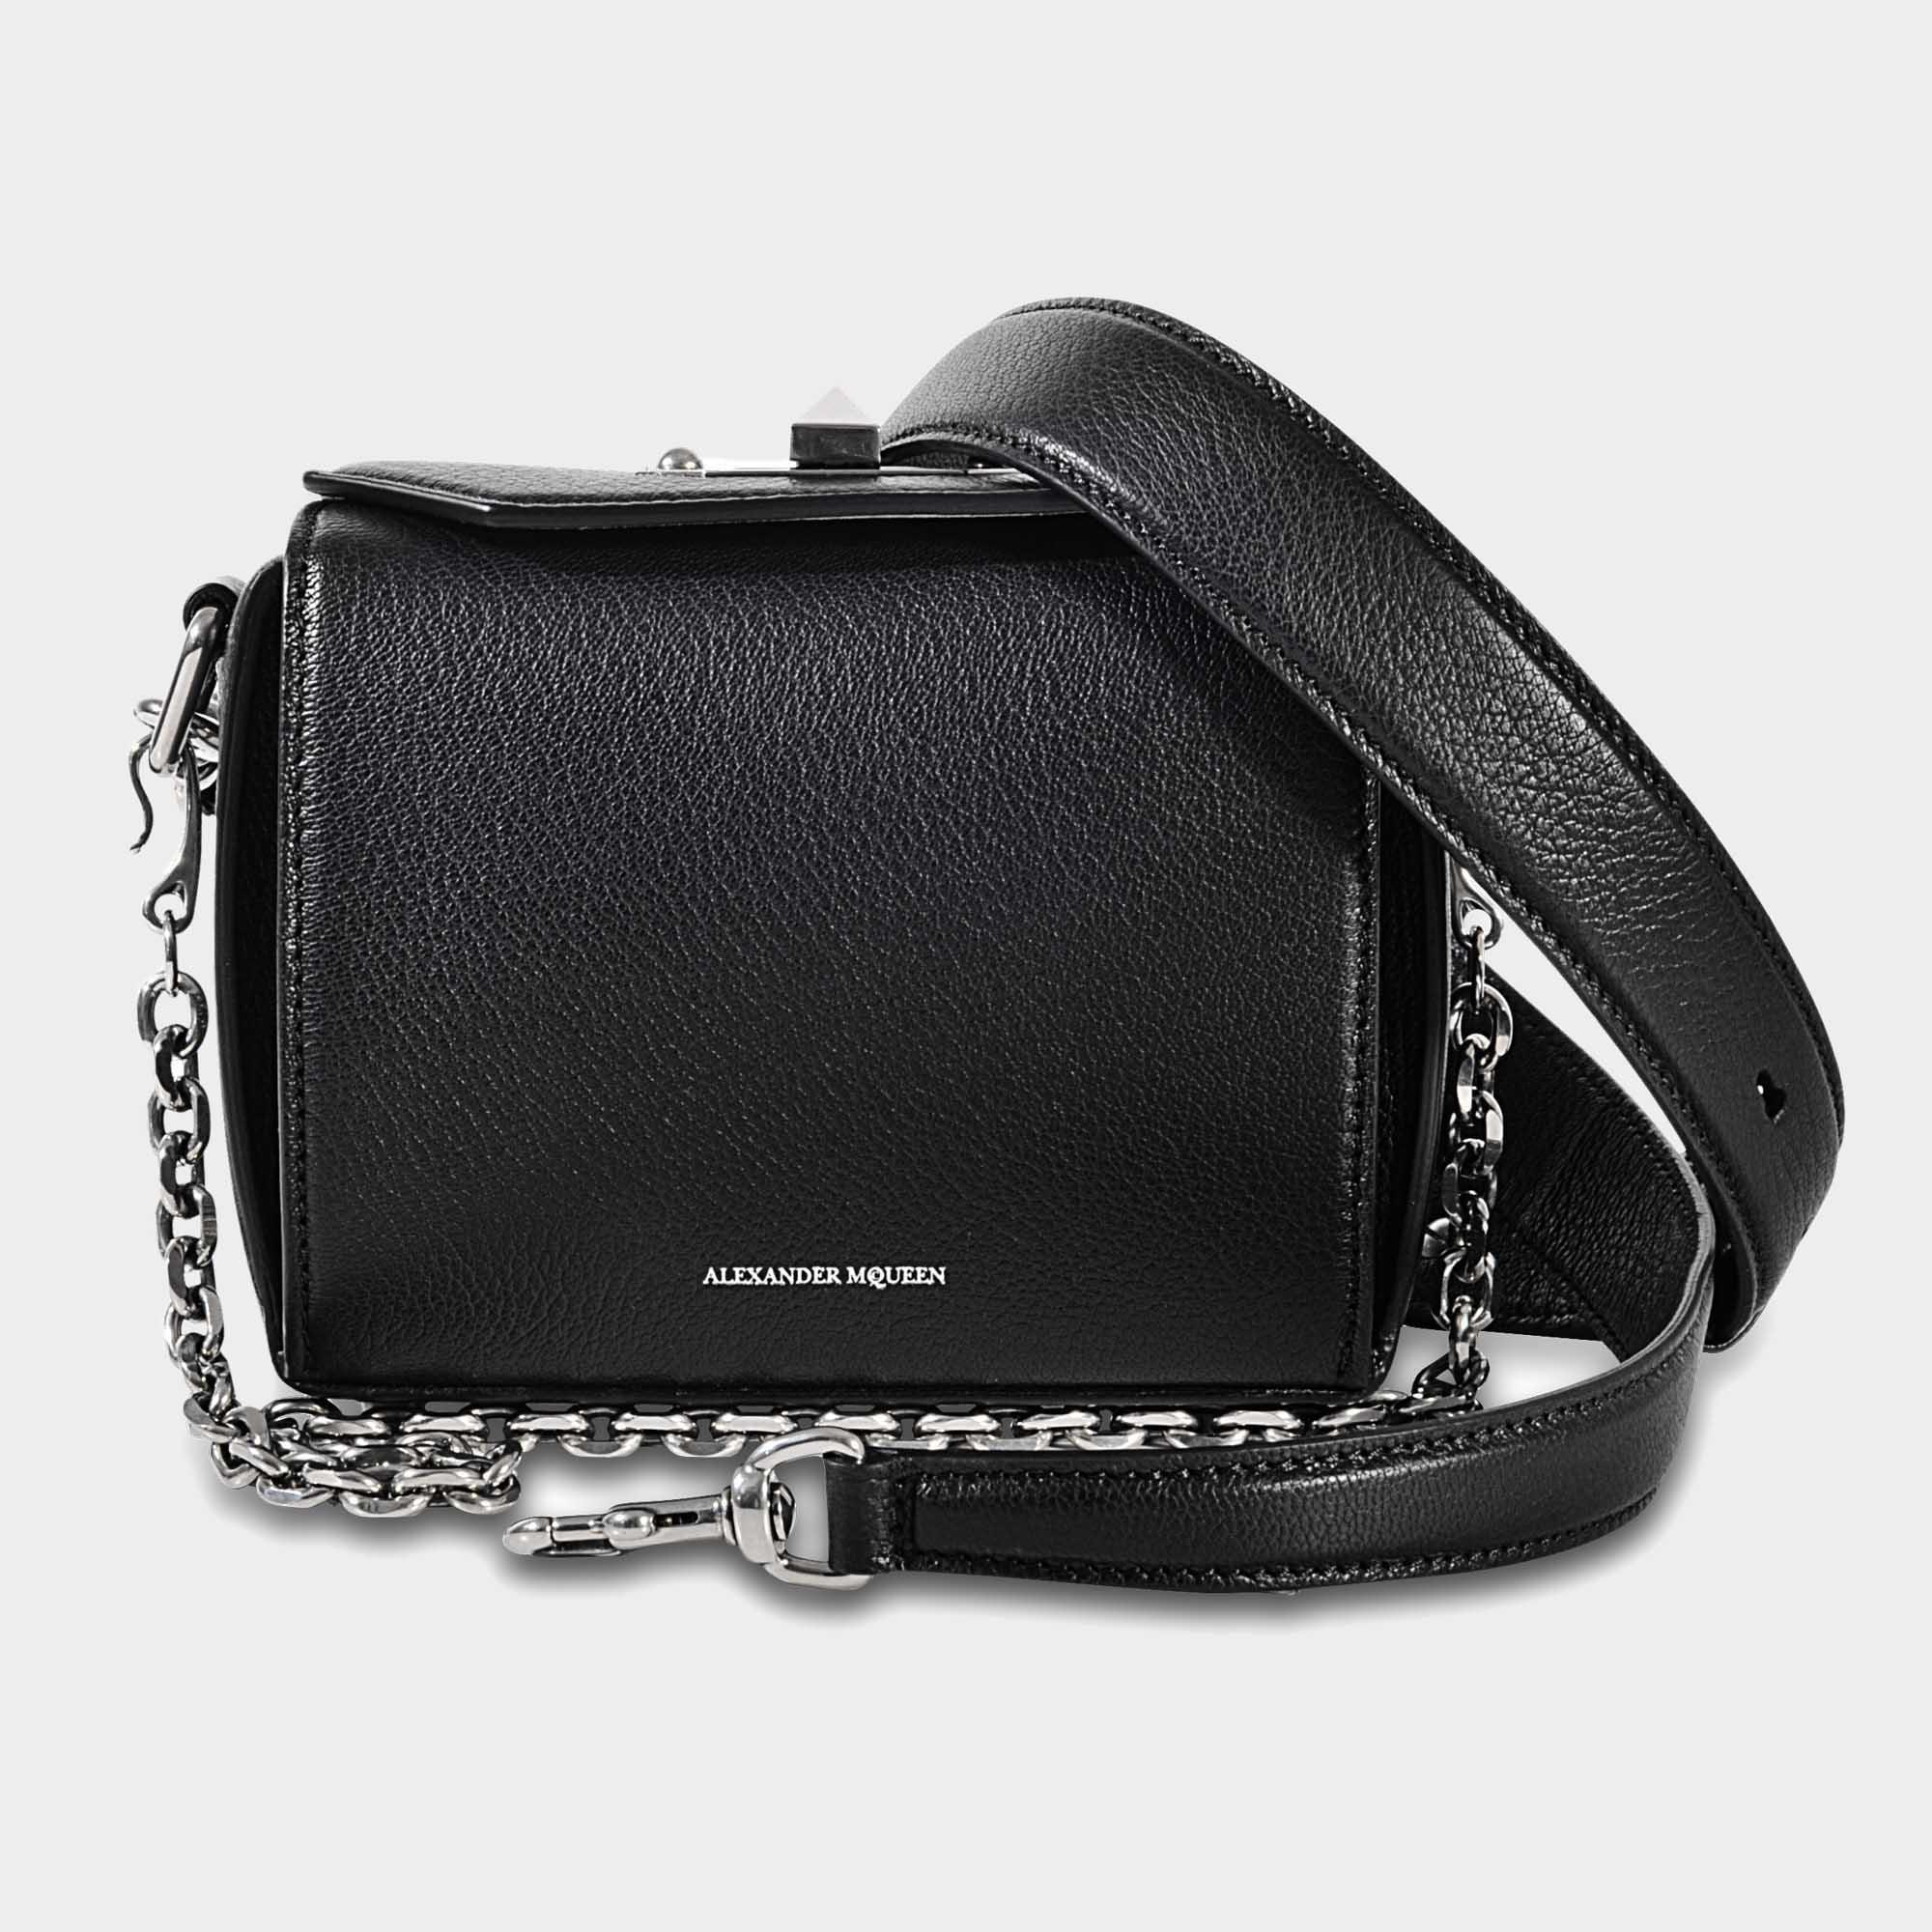 5528a9820b Lyst - Sac box 15 Alexander McQueen en coloris Noir